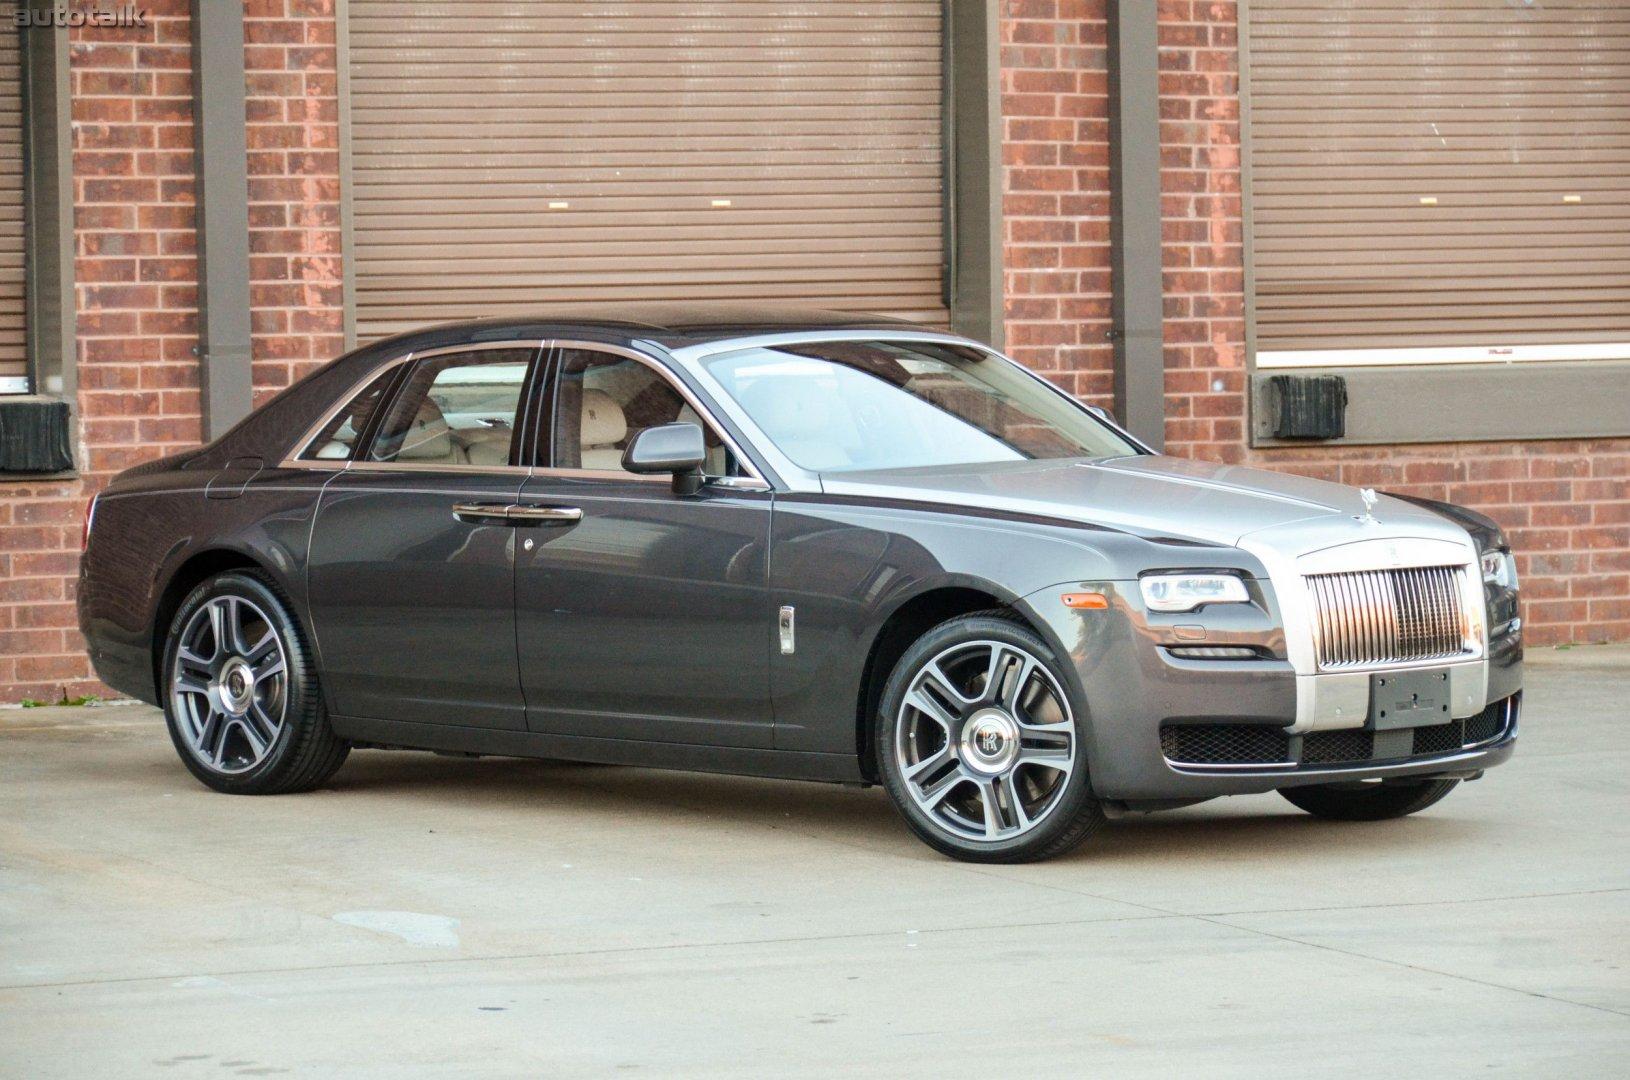 The Rolls Royce Ghost